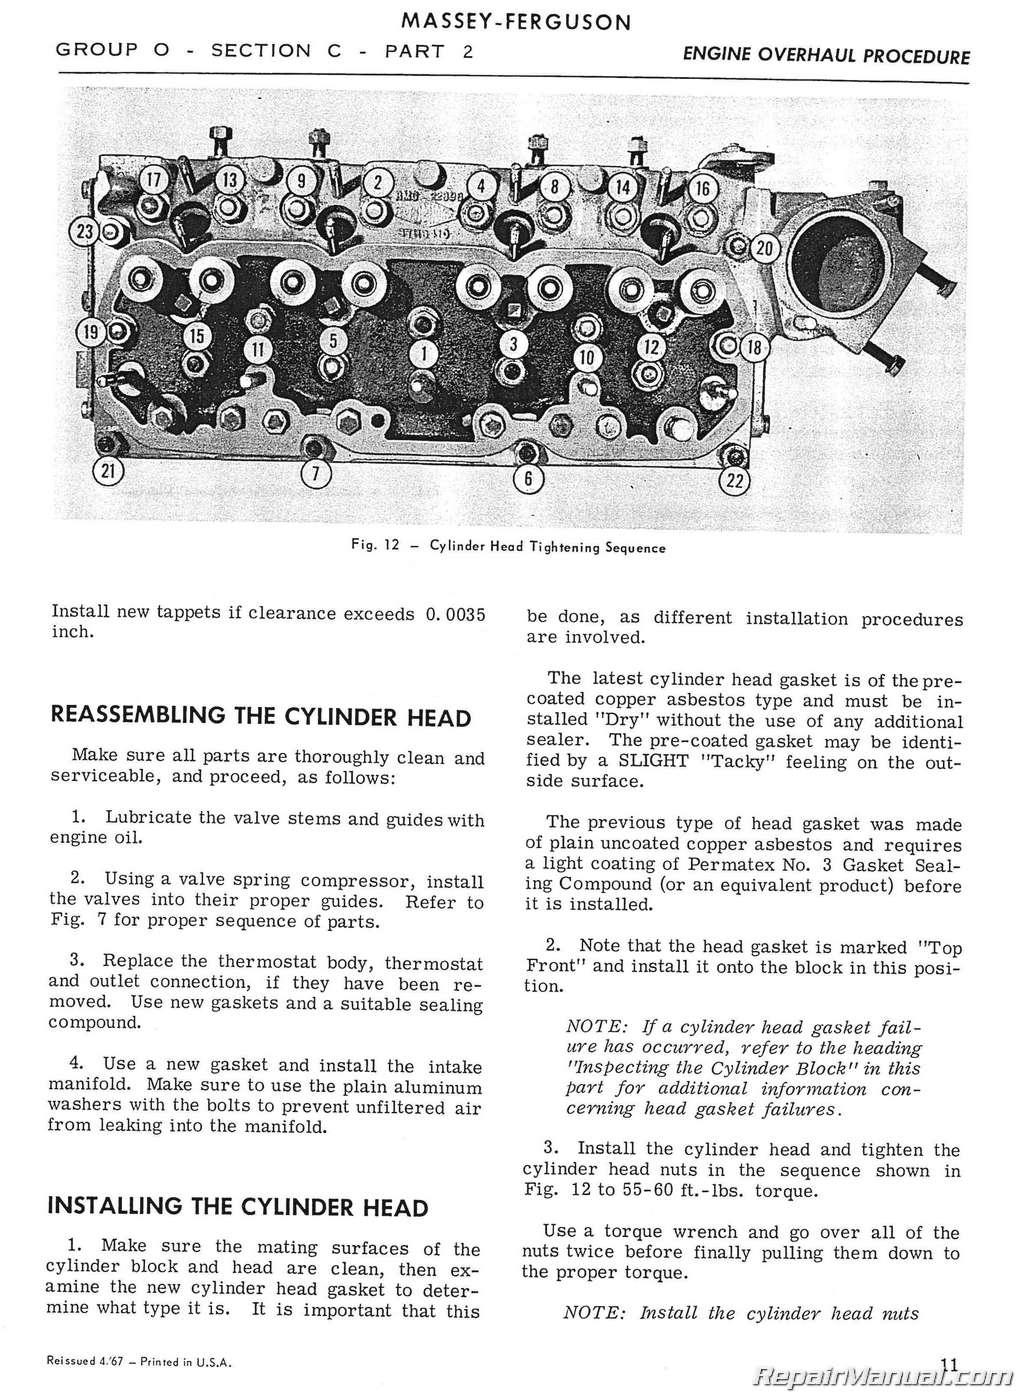 massey ferguson mf 302 mf 304 tractor mf 320 backhoe service massey ferguson mf 302 mf 304 tractor mf 320 backhoe service manual